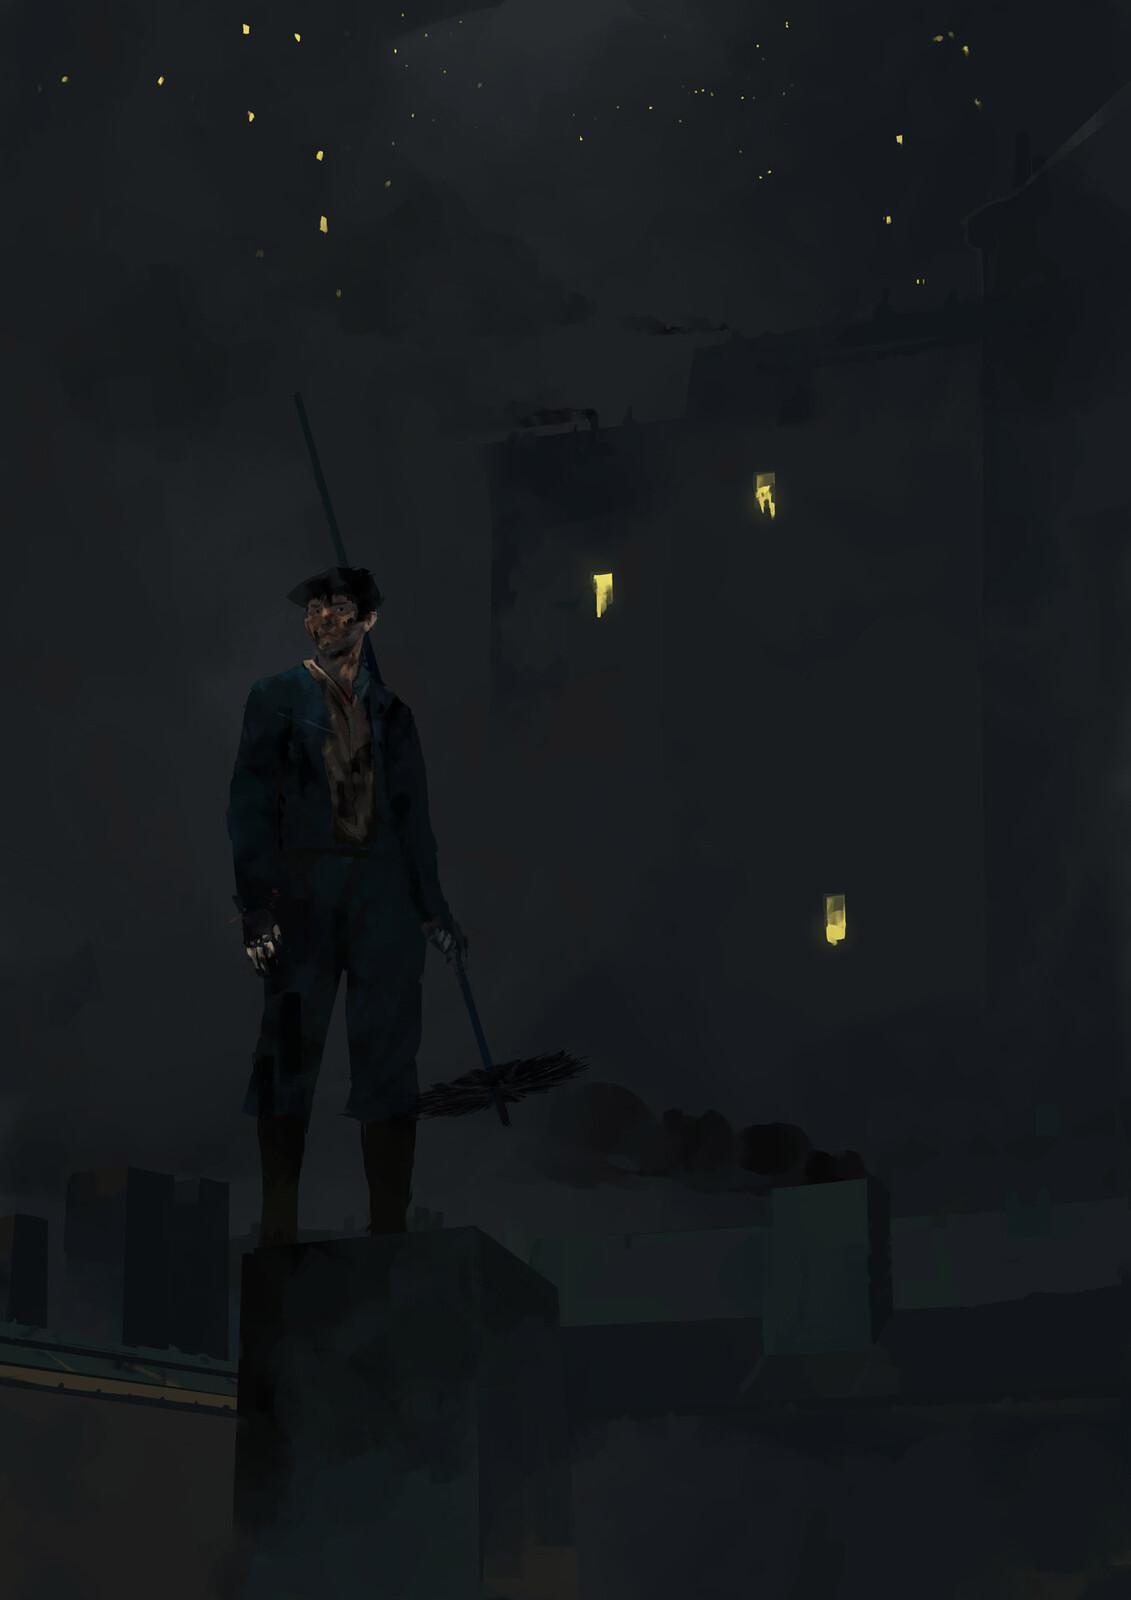 Inktober2019 - Day 26 - Dark